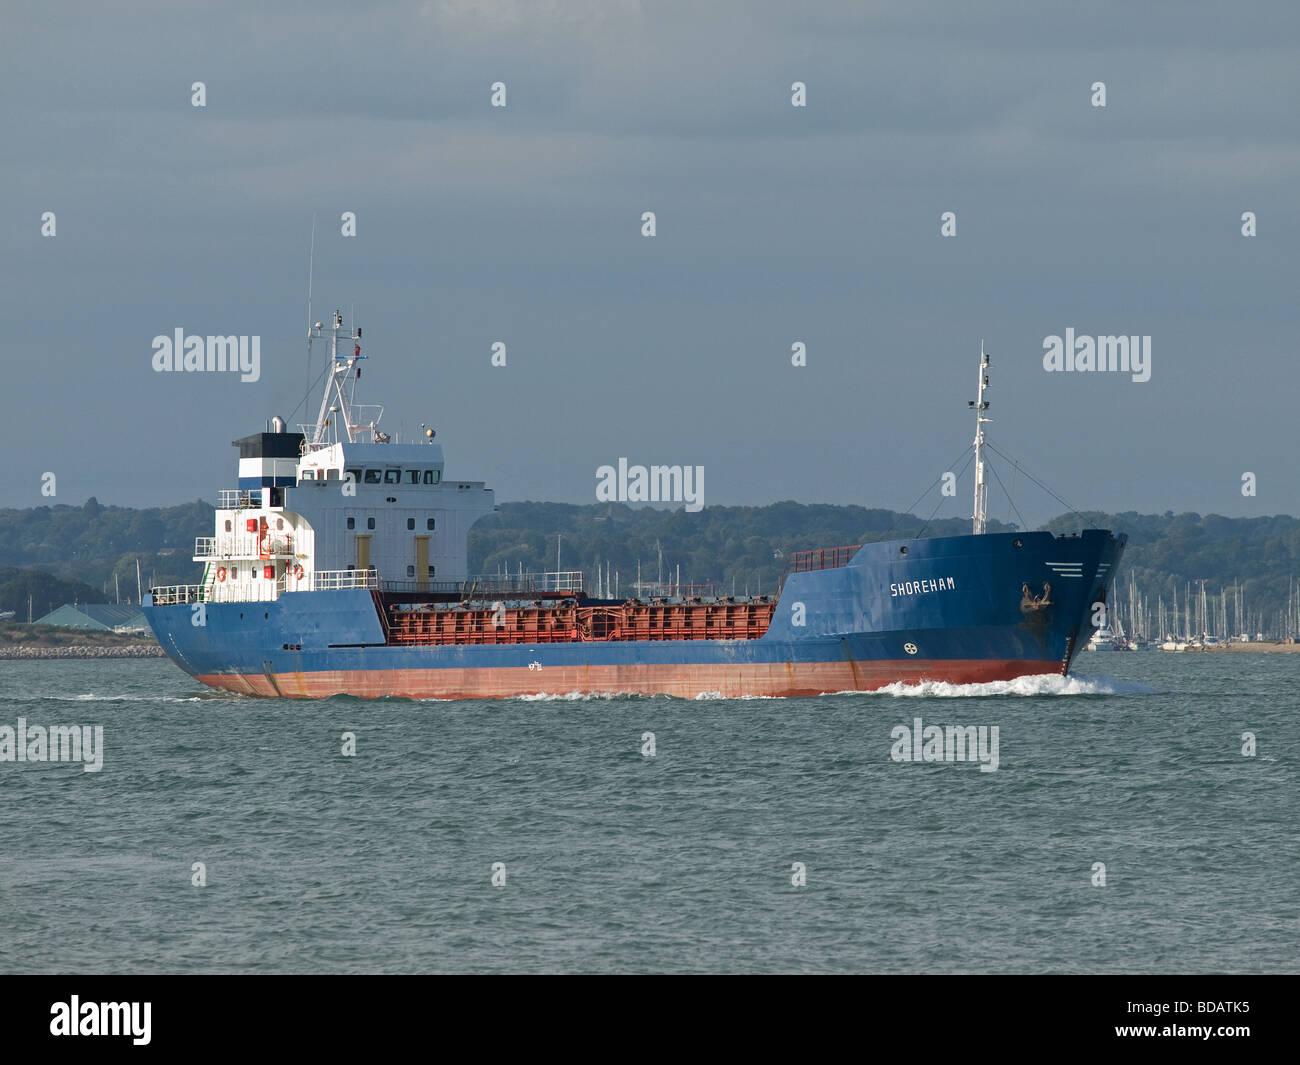 General cargo ship Shoreham leaving Southampton UK - Stock Image